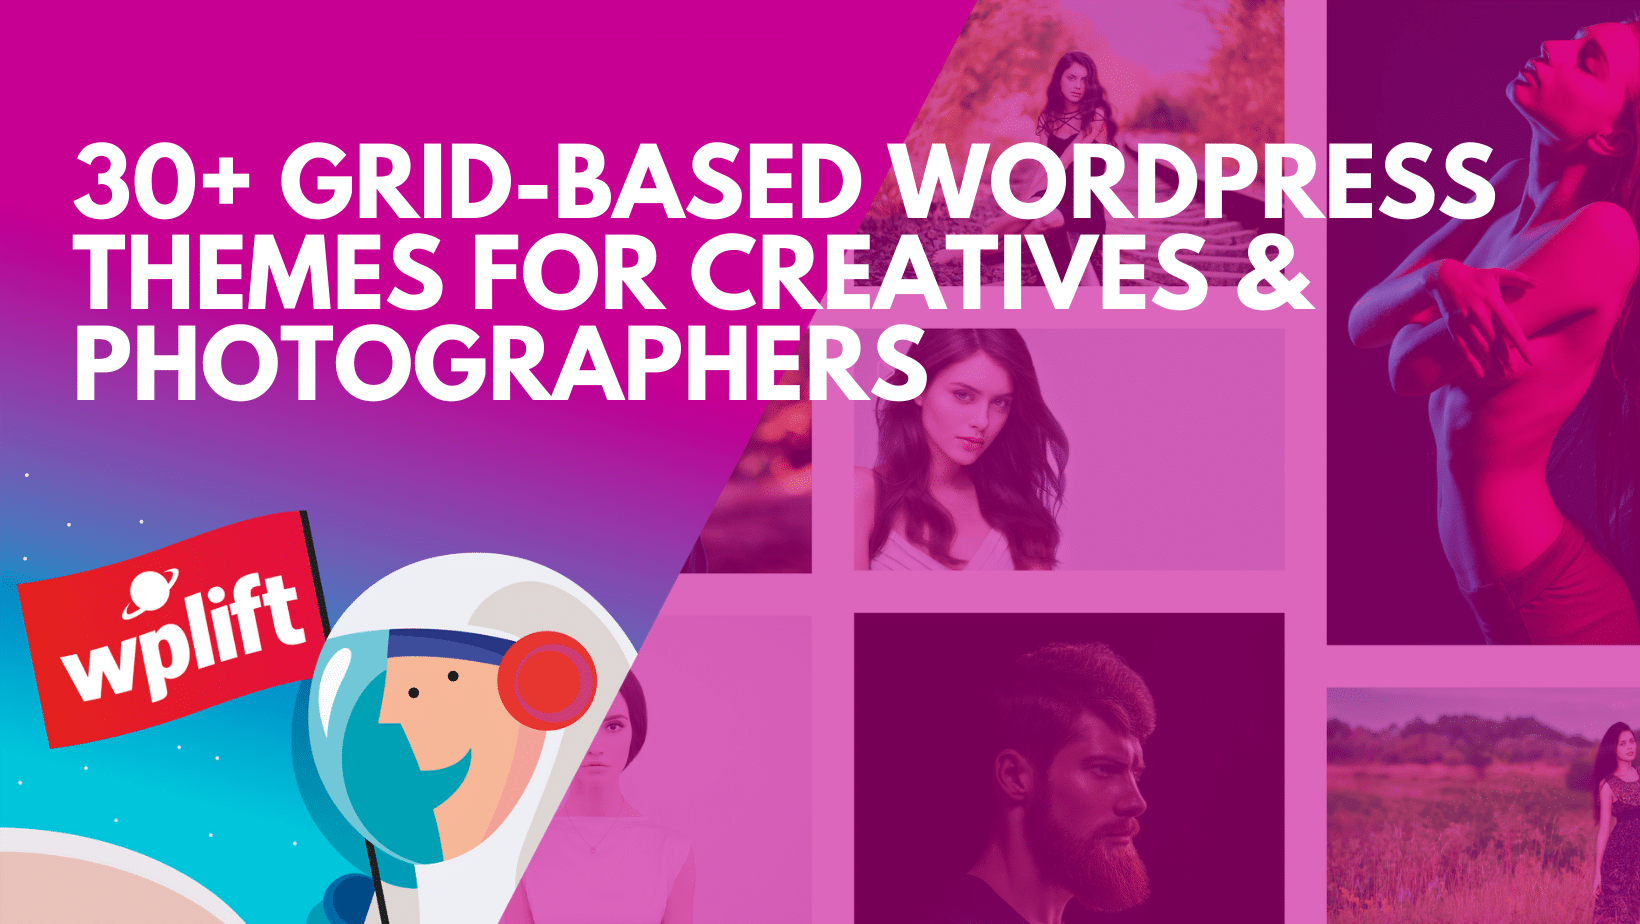 30+ Grid WordPress Themes – The Best Grid-Based WordPress Themes